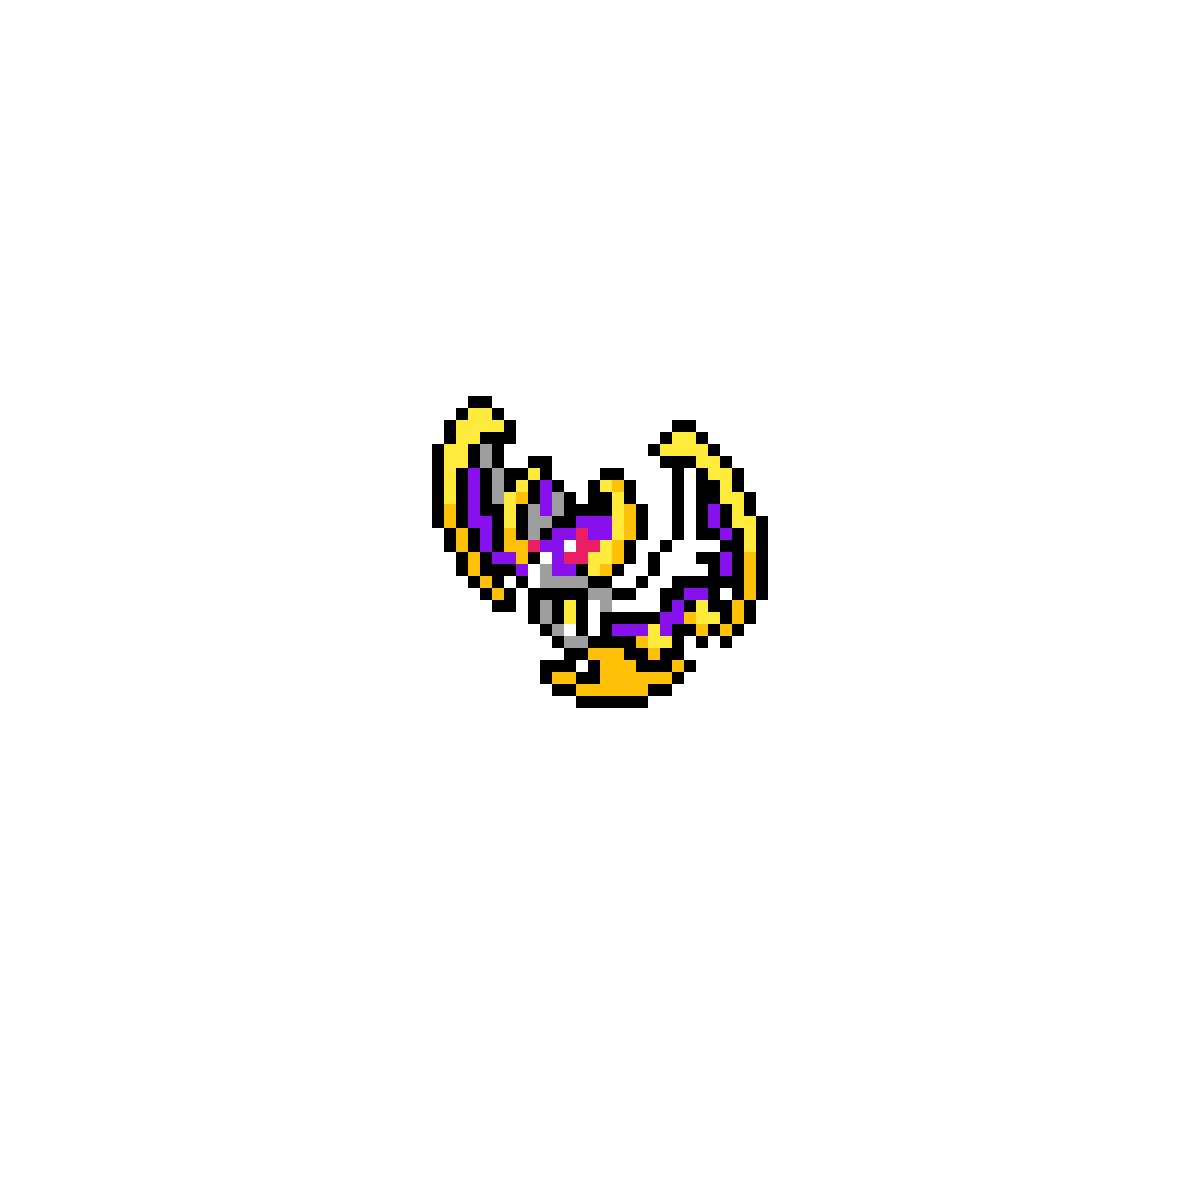 Pixilart Pixel Lunala By Mrboopdoop